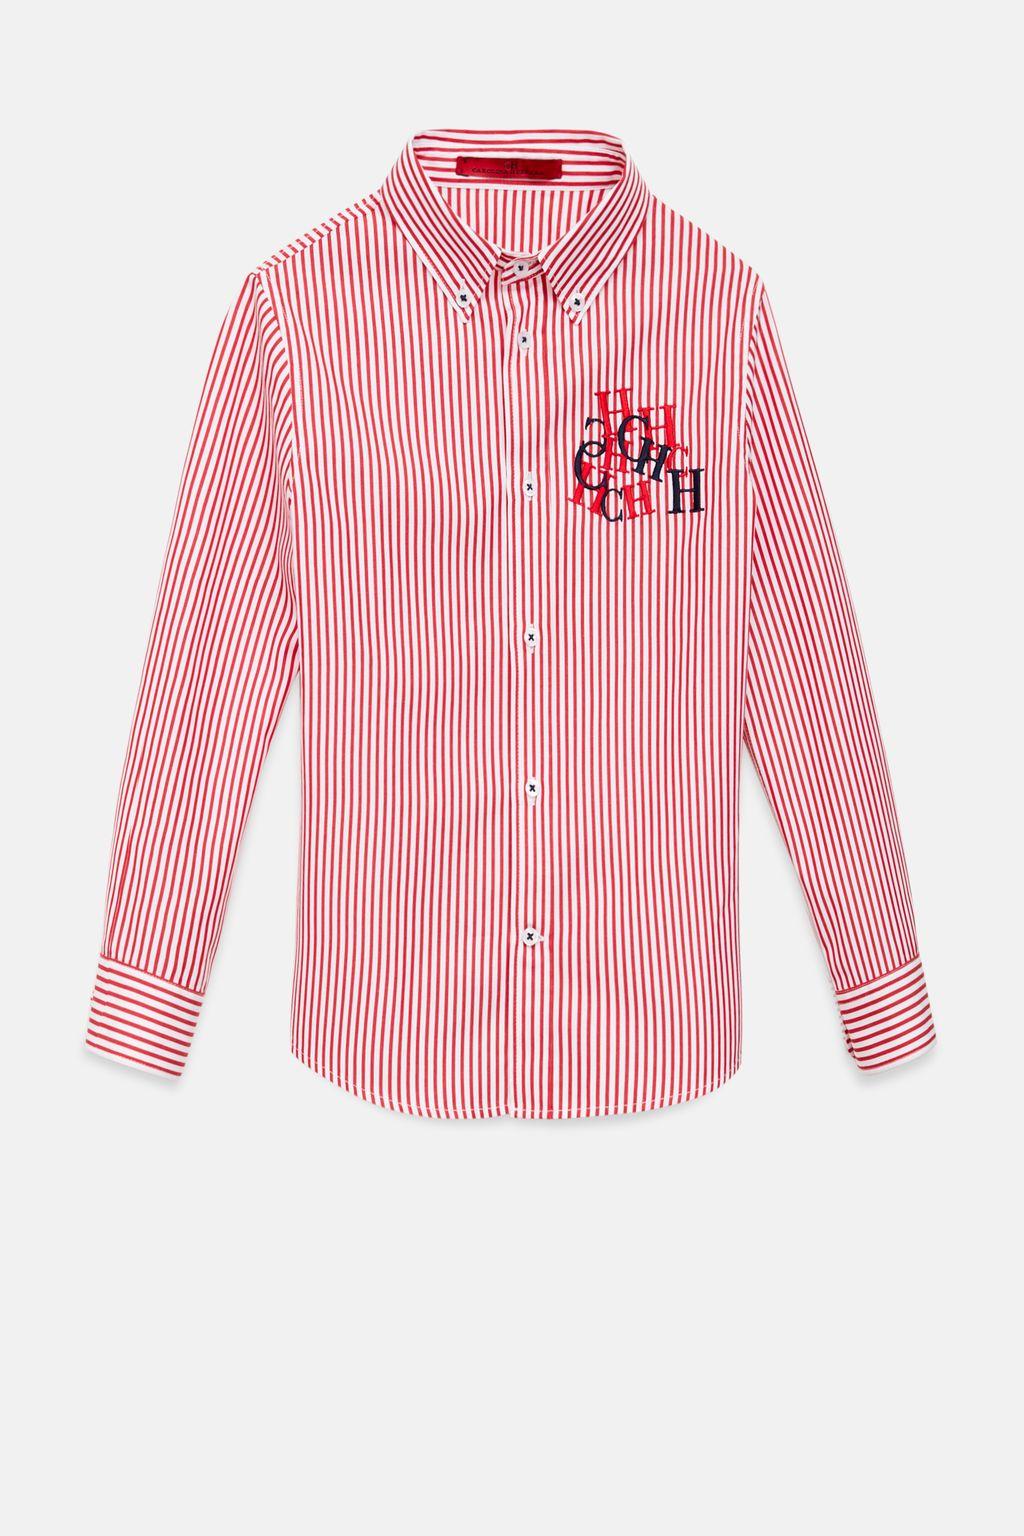 CH Swing striped shirt